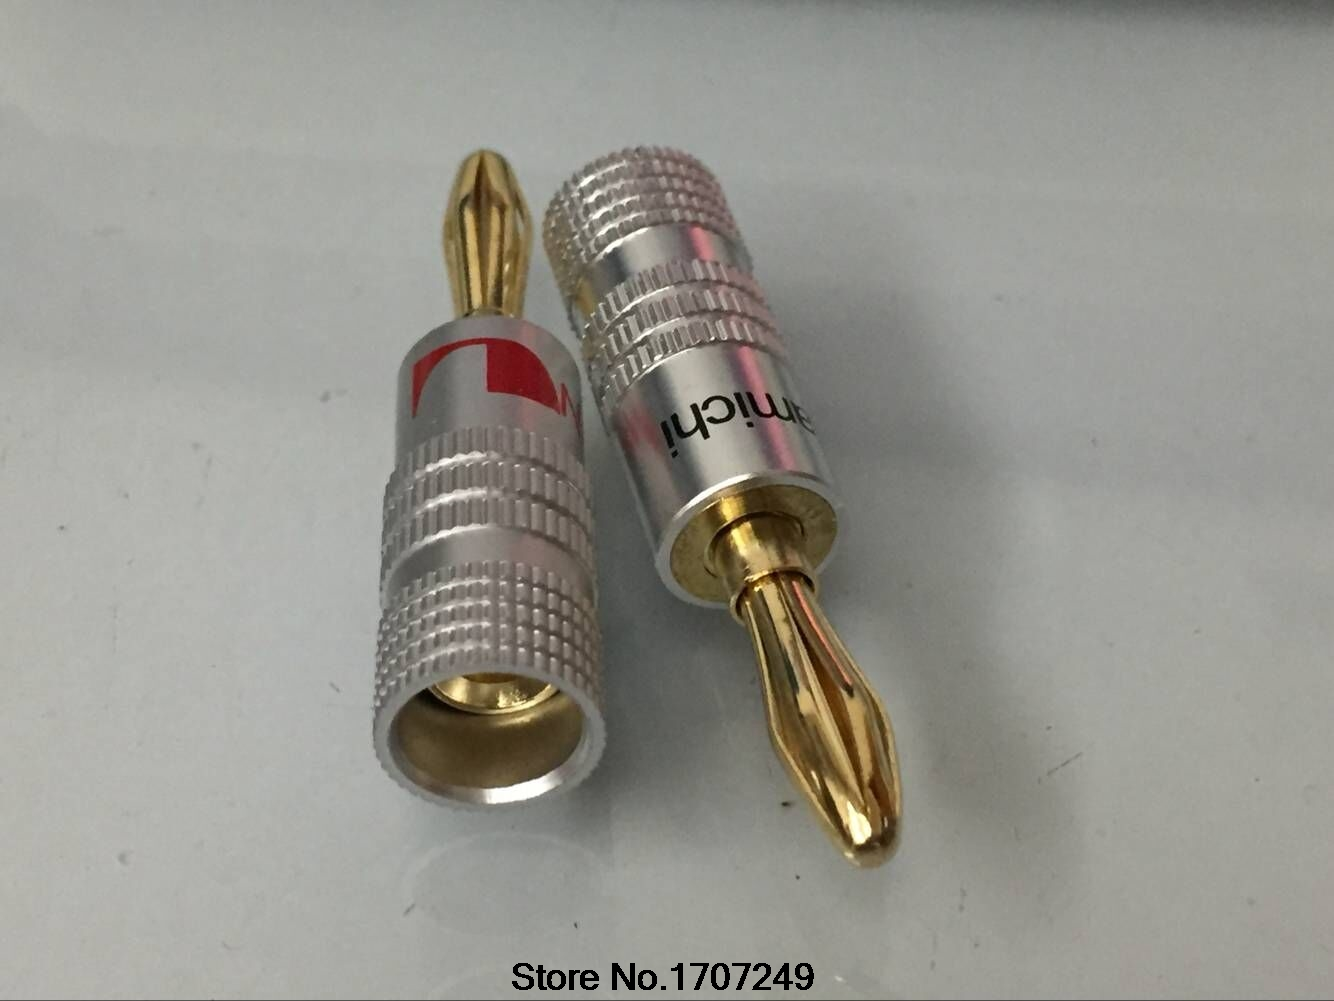 ∞Nakamichi Pure Copper Gilded 4mm Speaker connector / banana plug ...